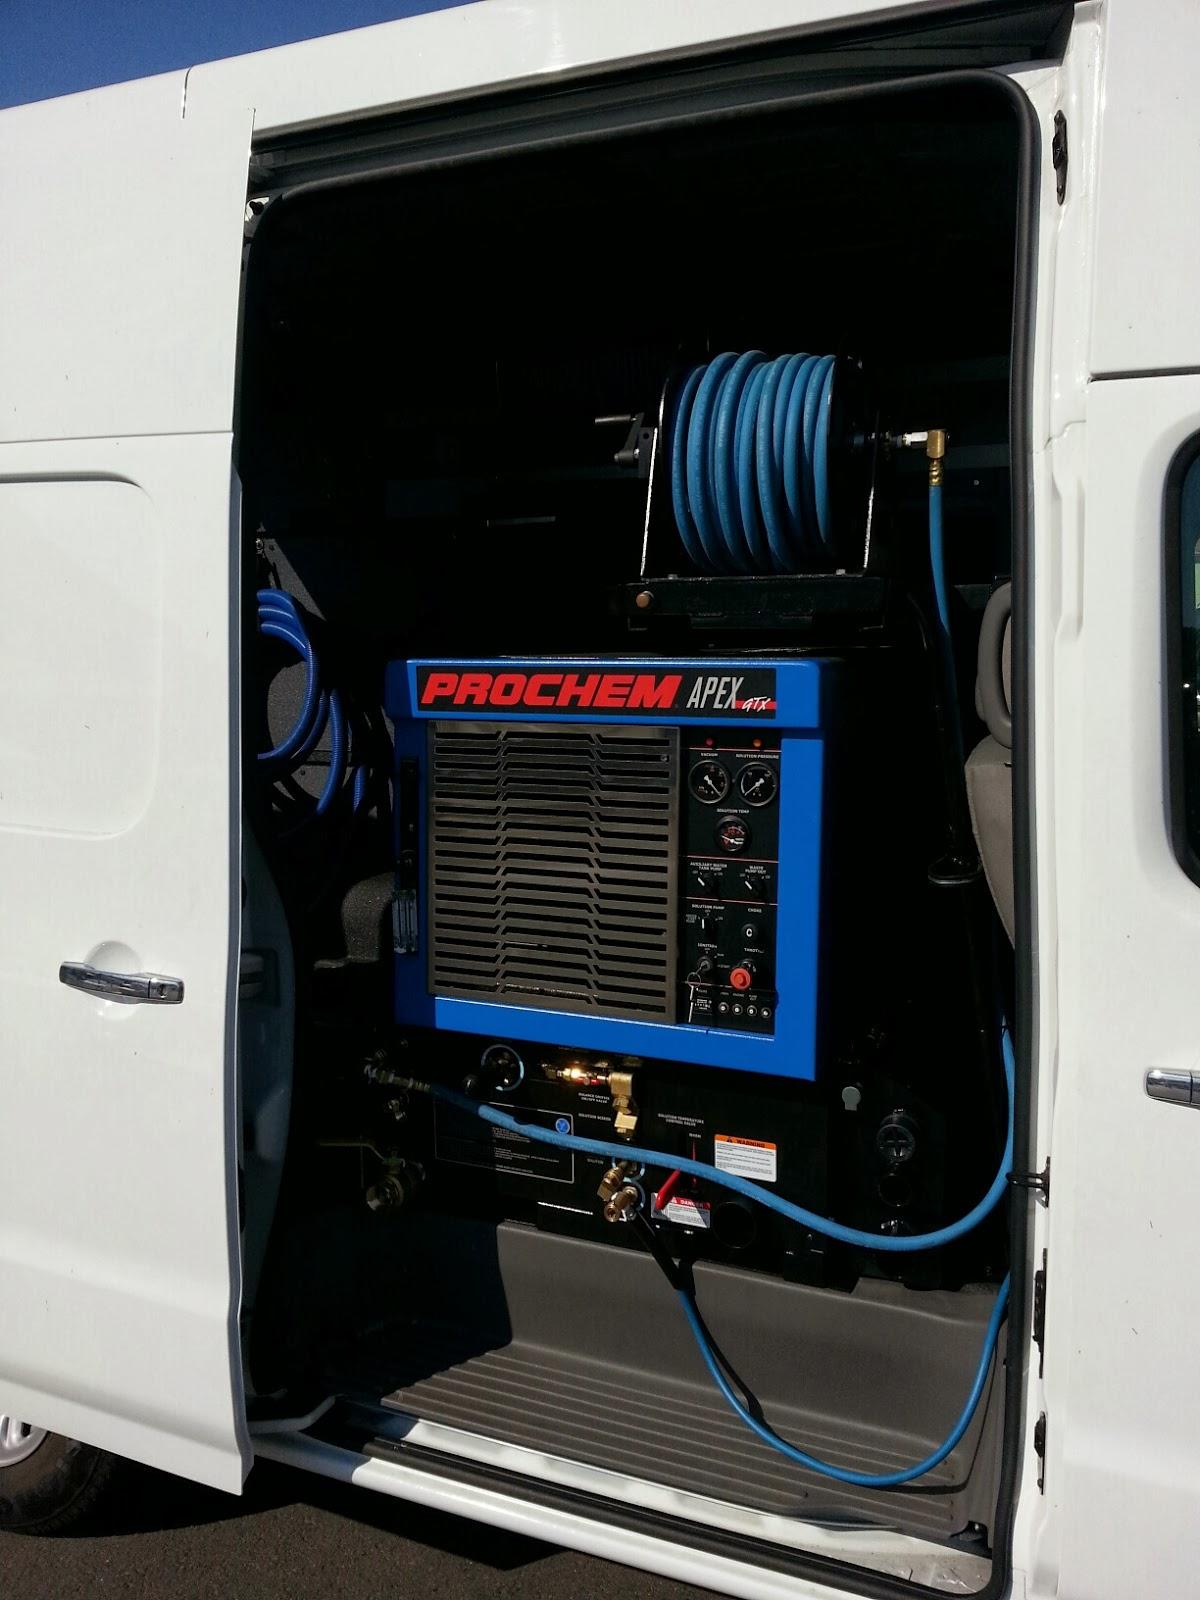 Vacaville Nissan Fleet: Nissan NV Cargo Van with Carpet ...